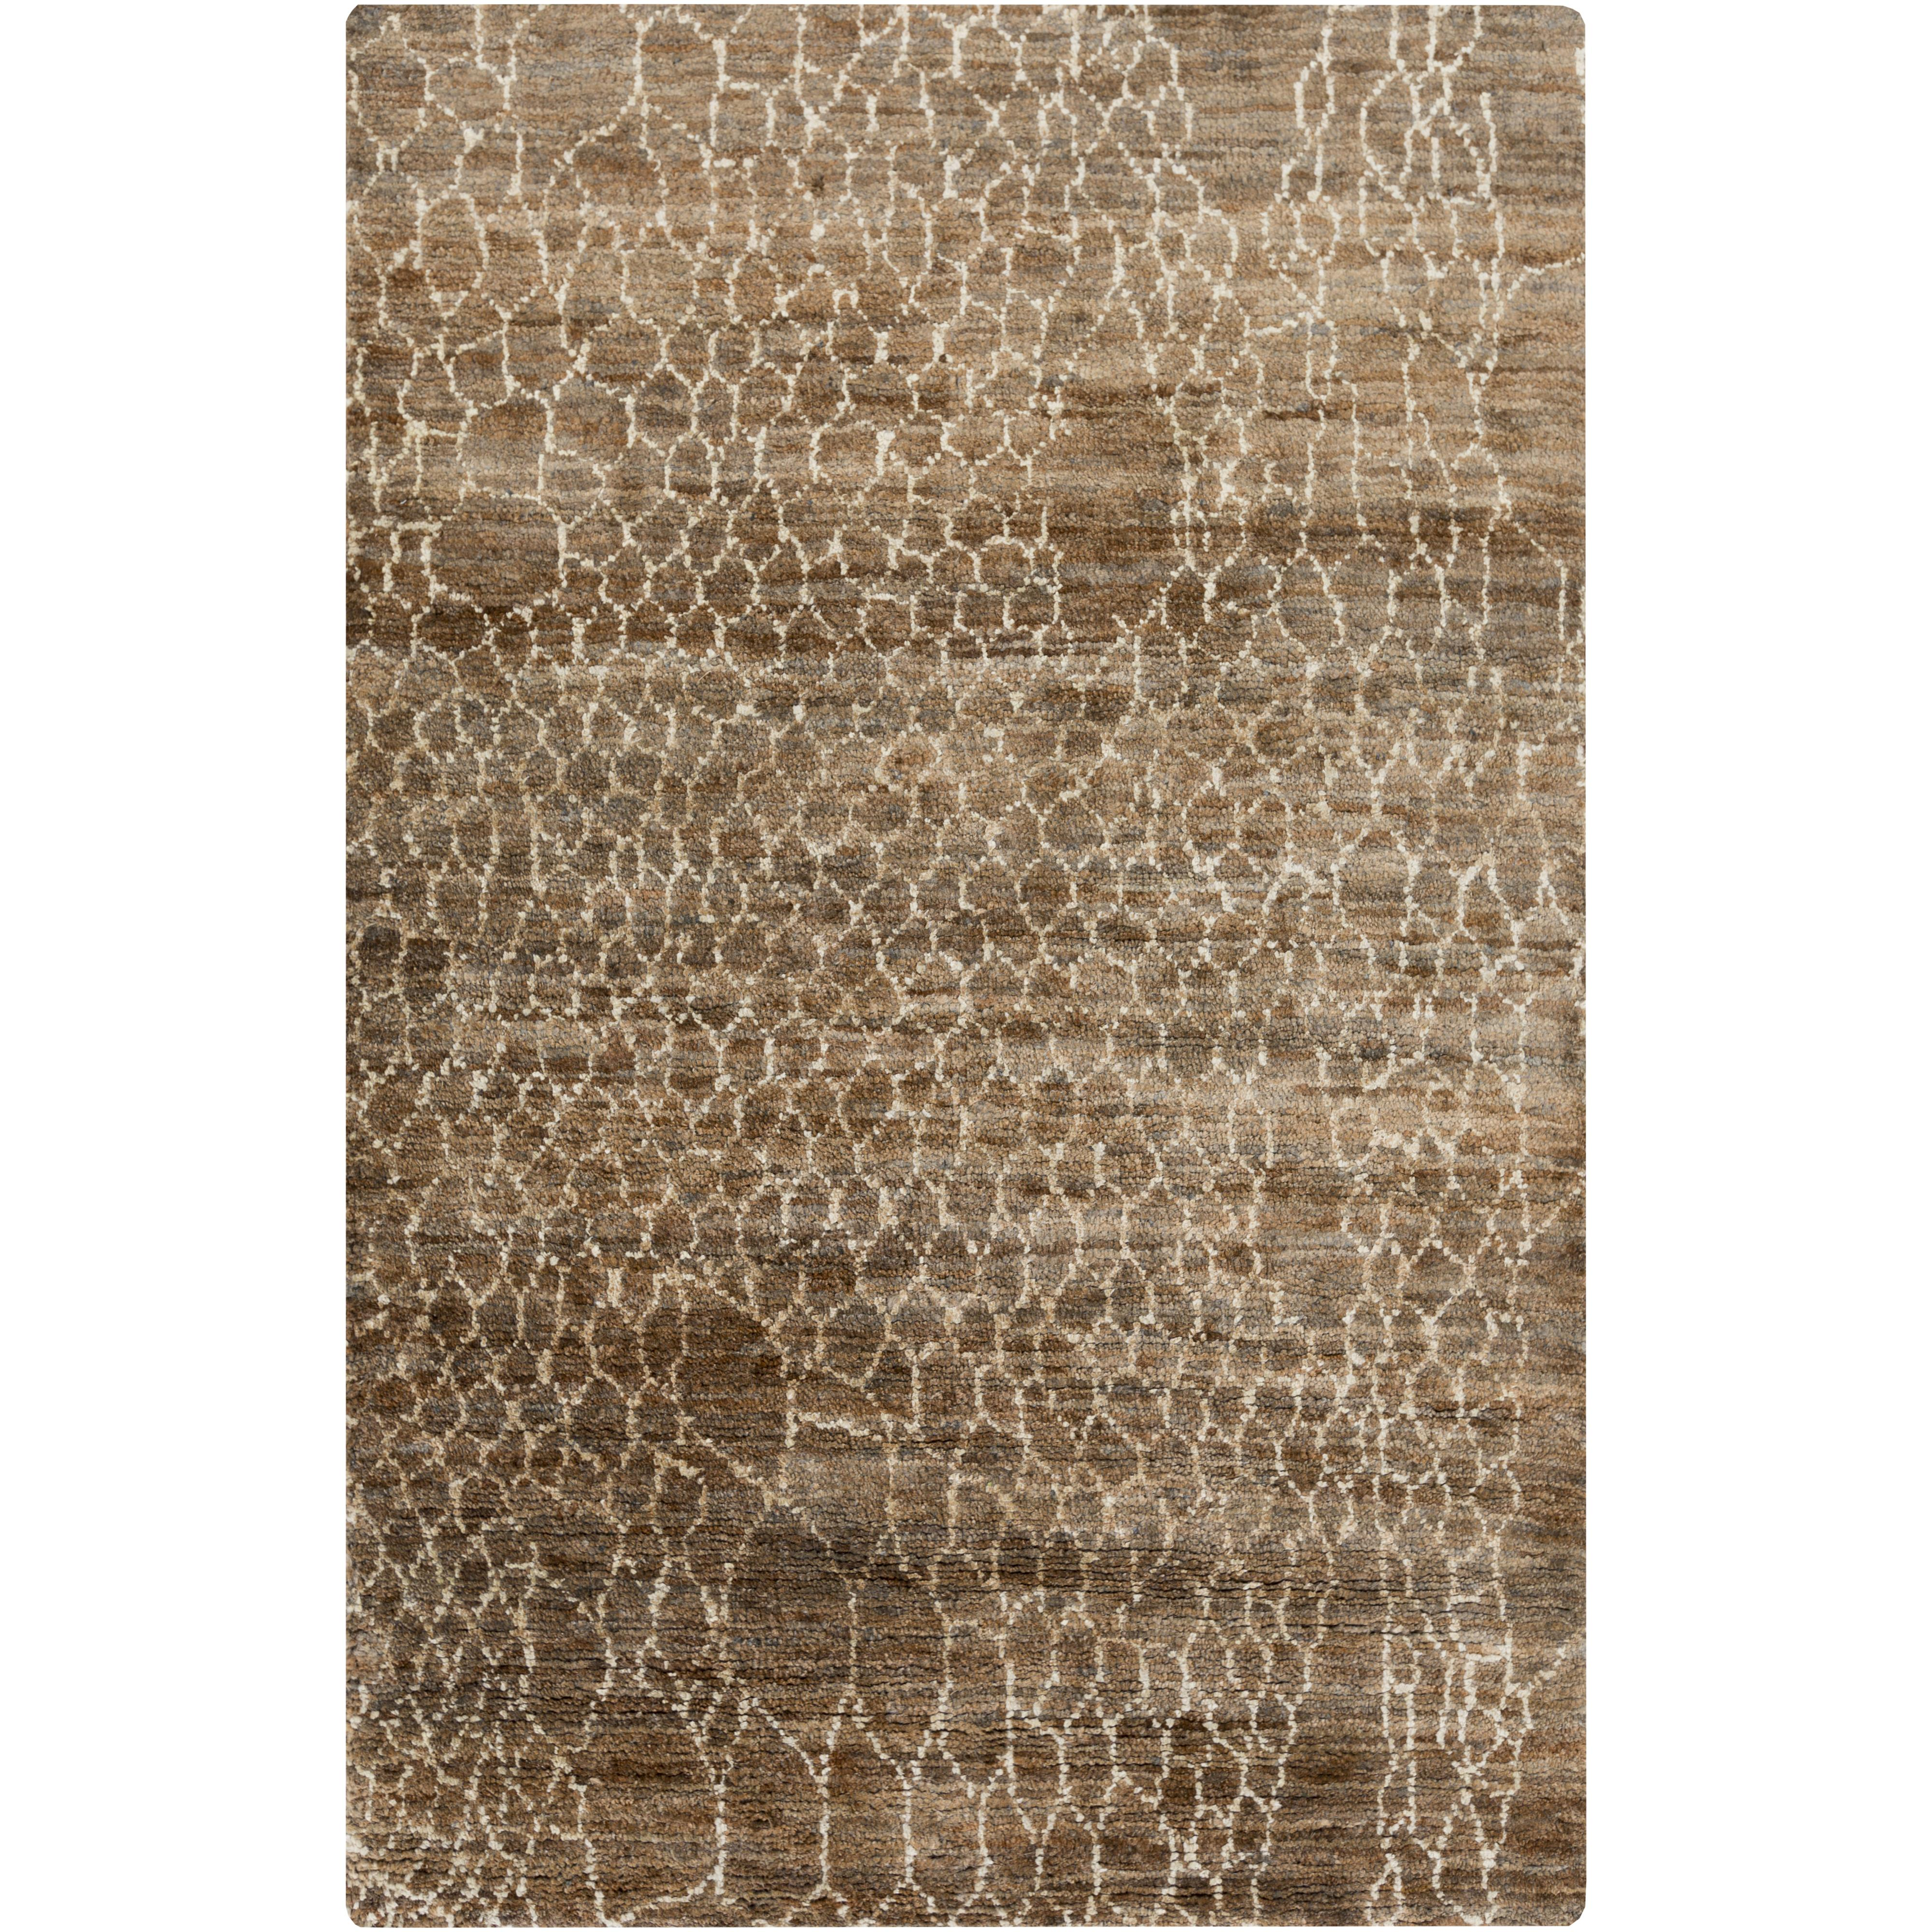 Bjorn 8 39 X 11 39 Becker Furniture World Rugs